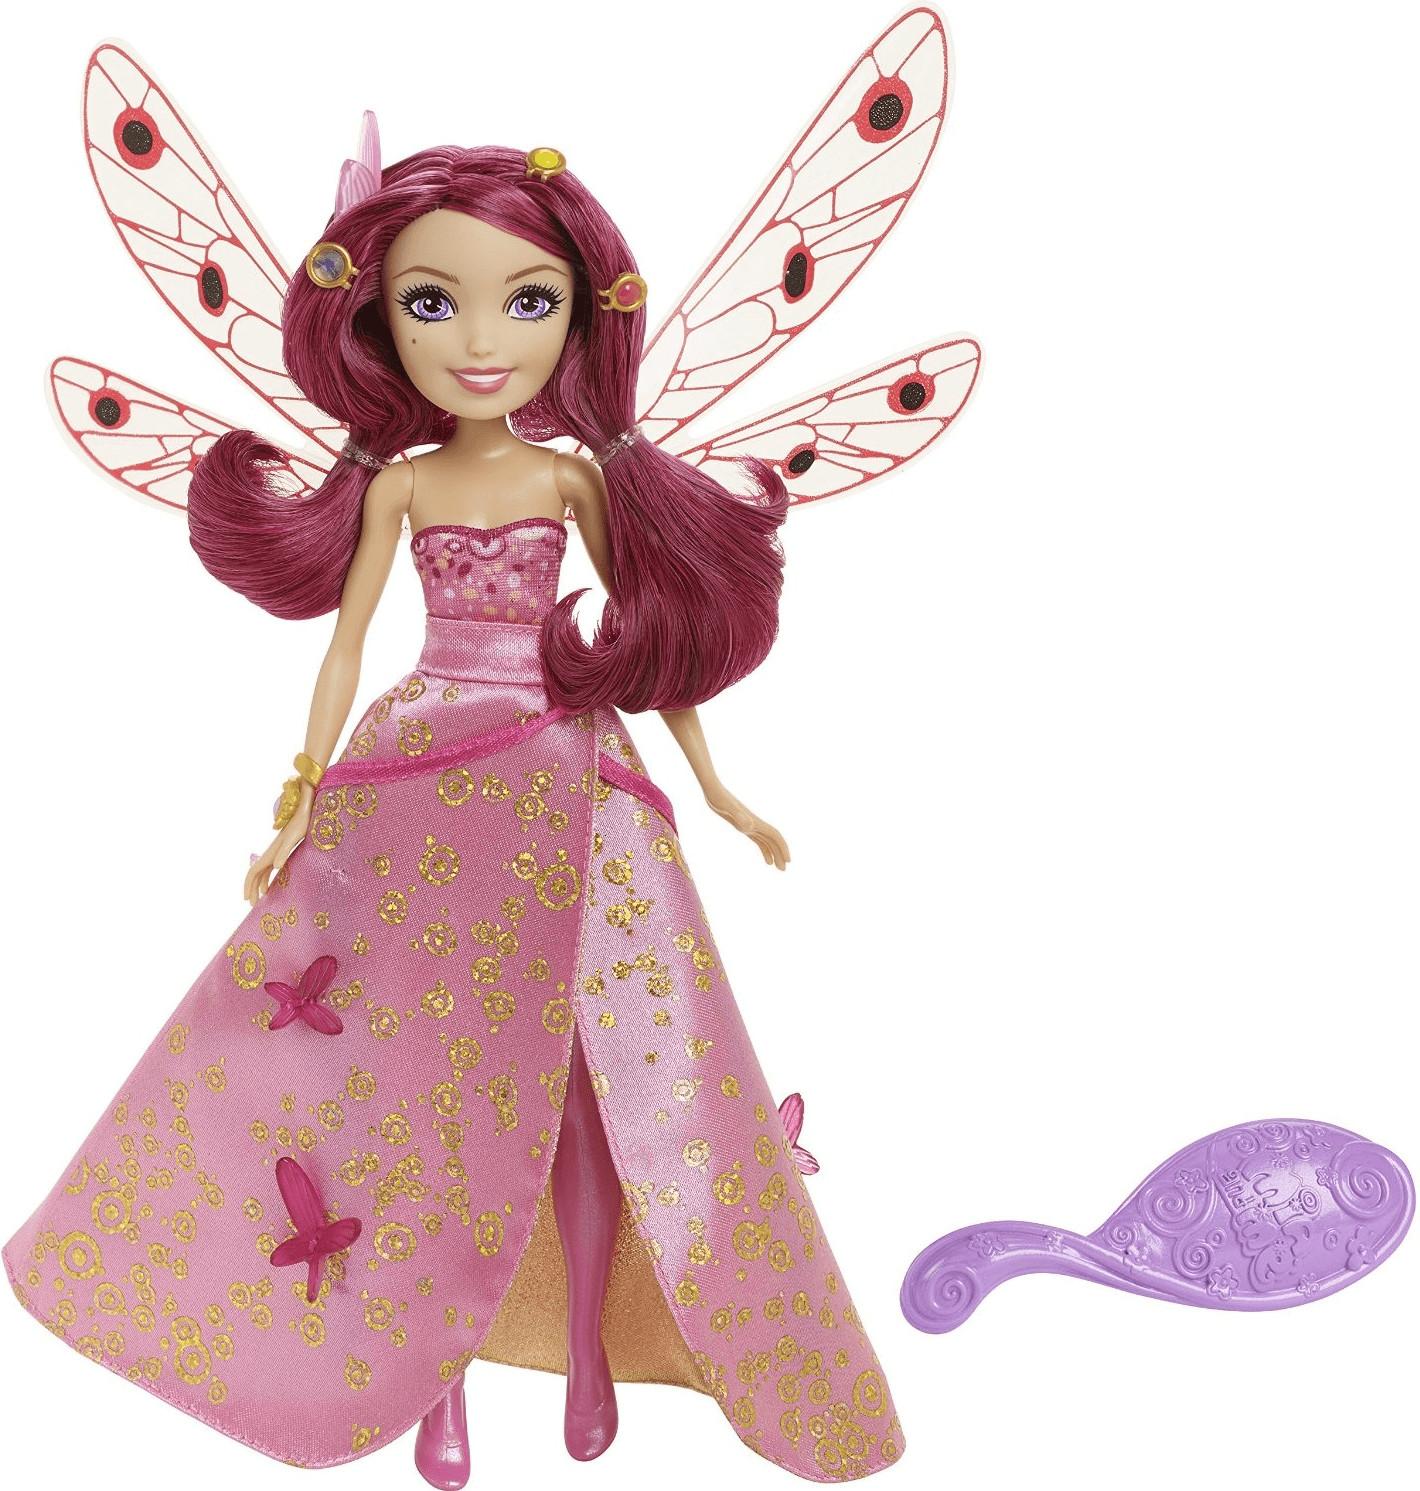 Mattel Mia and Me - CMM63